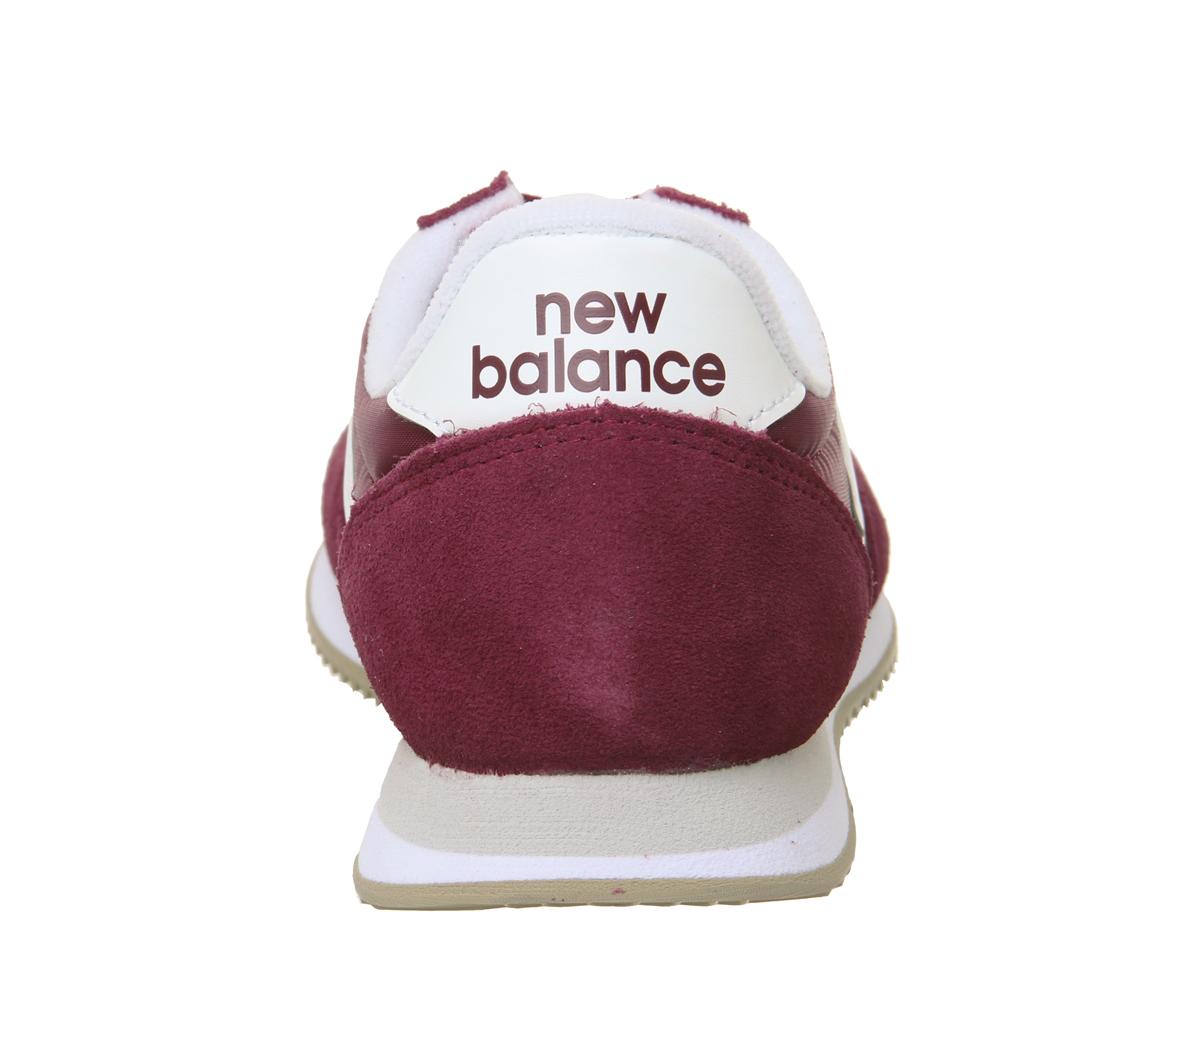 new balance burgundy sneakers,new balance femme blanche